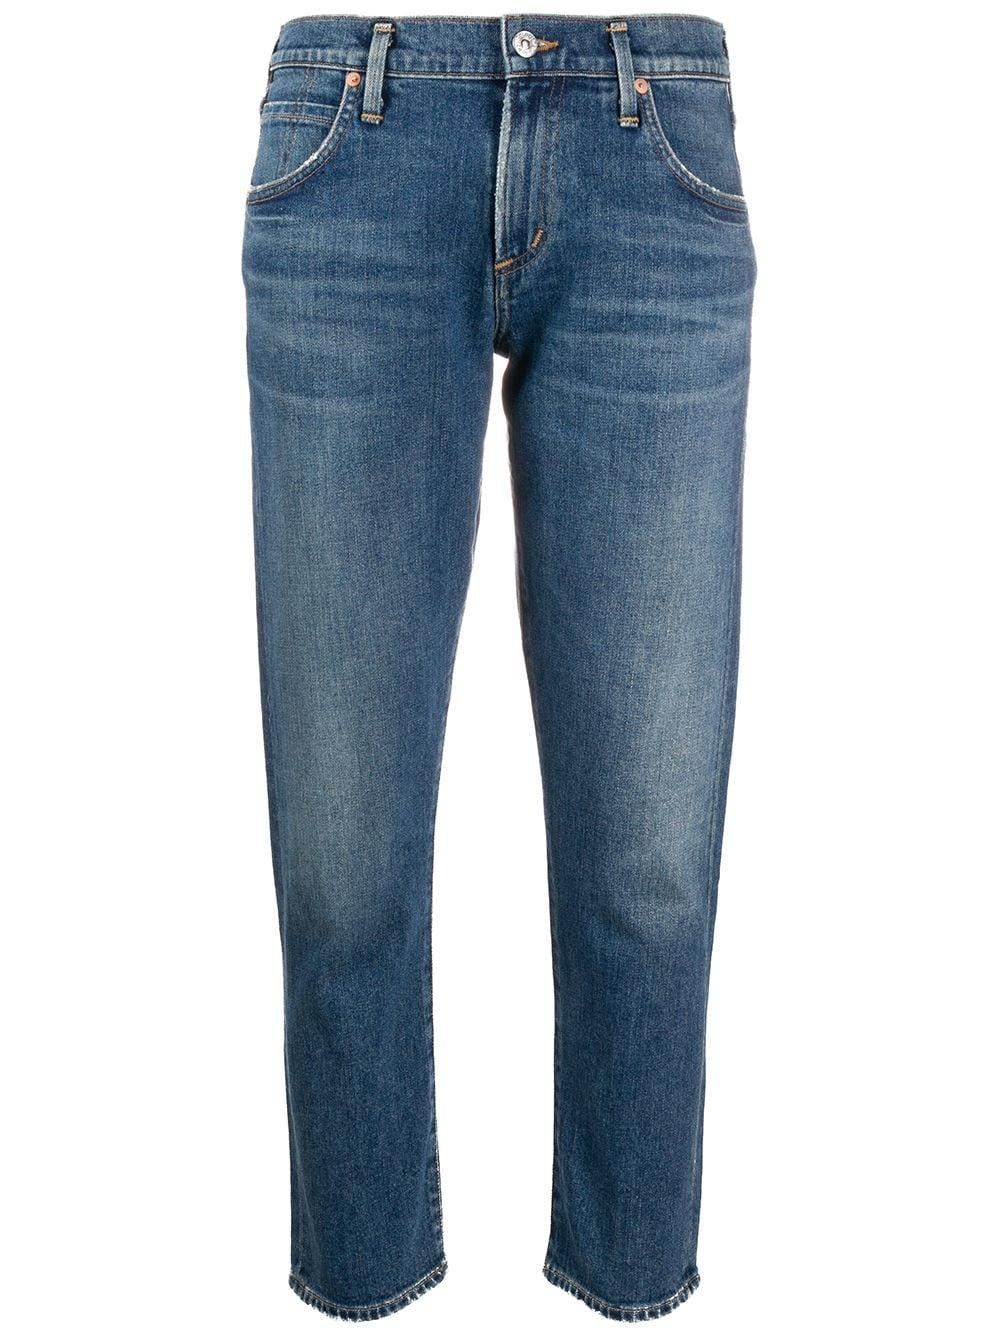 Elsa Mid Rise Slim Fit Crop Jean